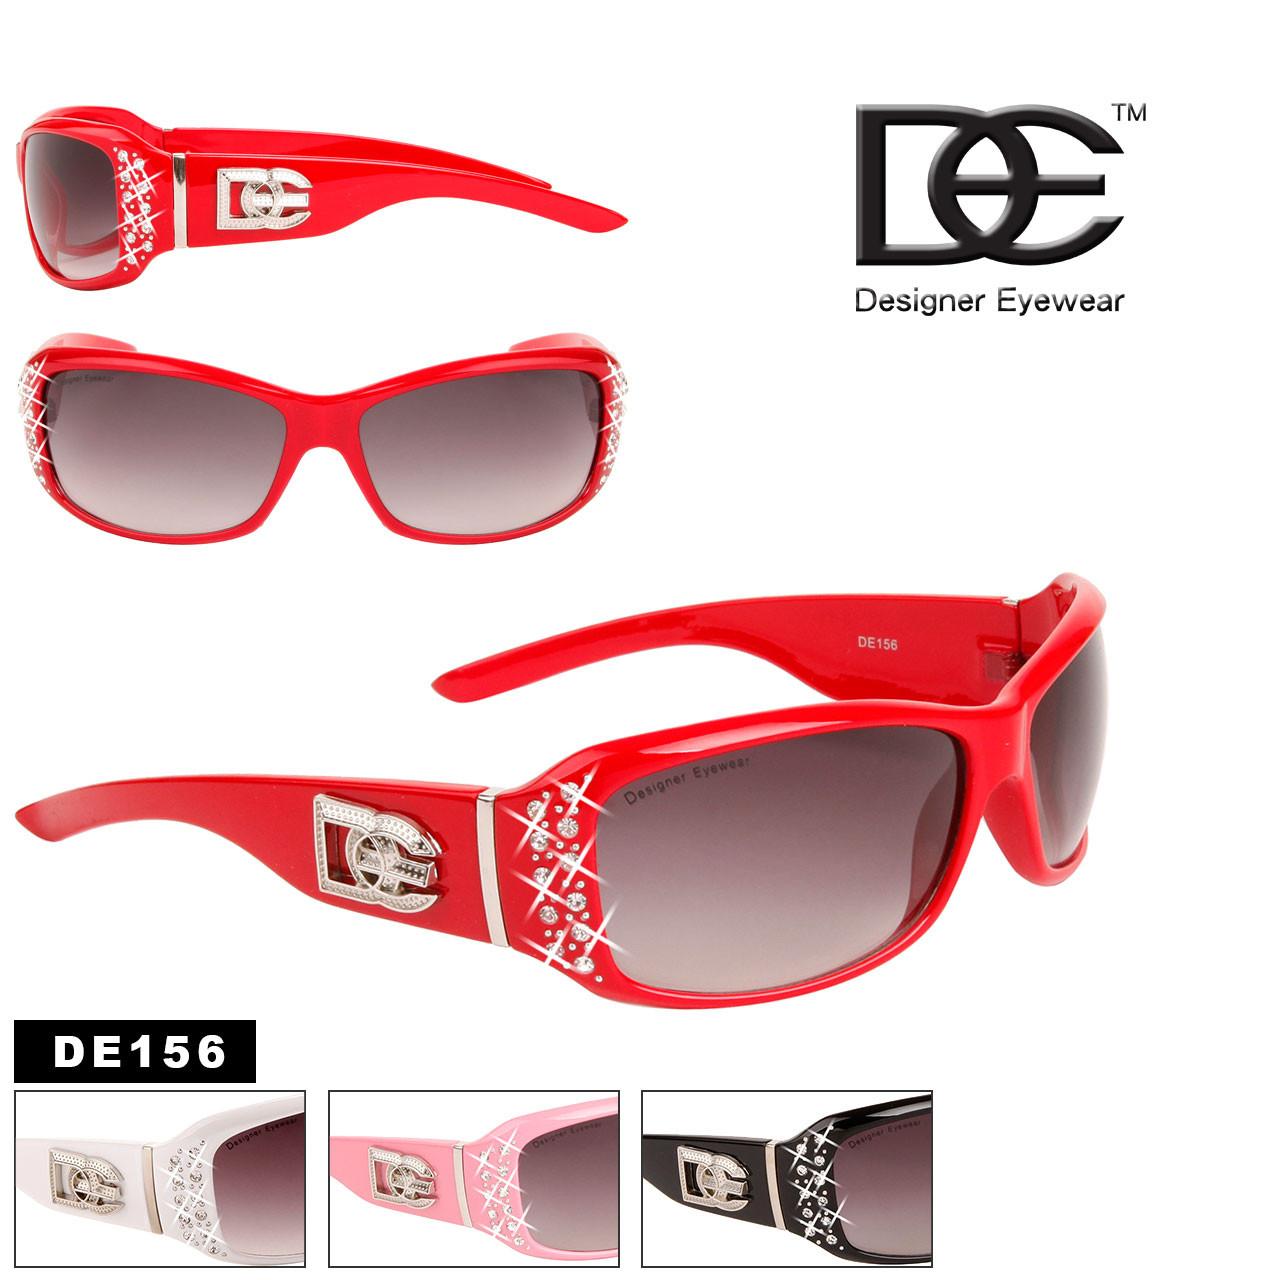 Wholesale Women's Sunglasses with Rhinestones - Style #DE156